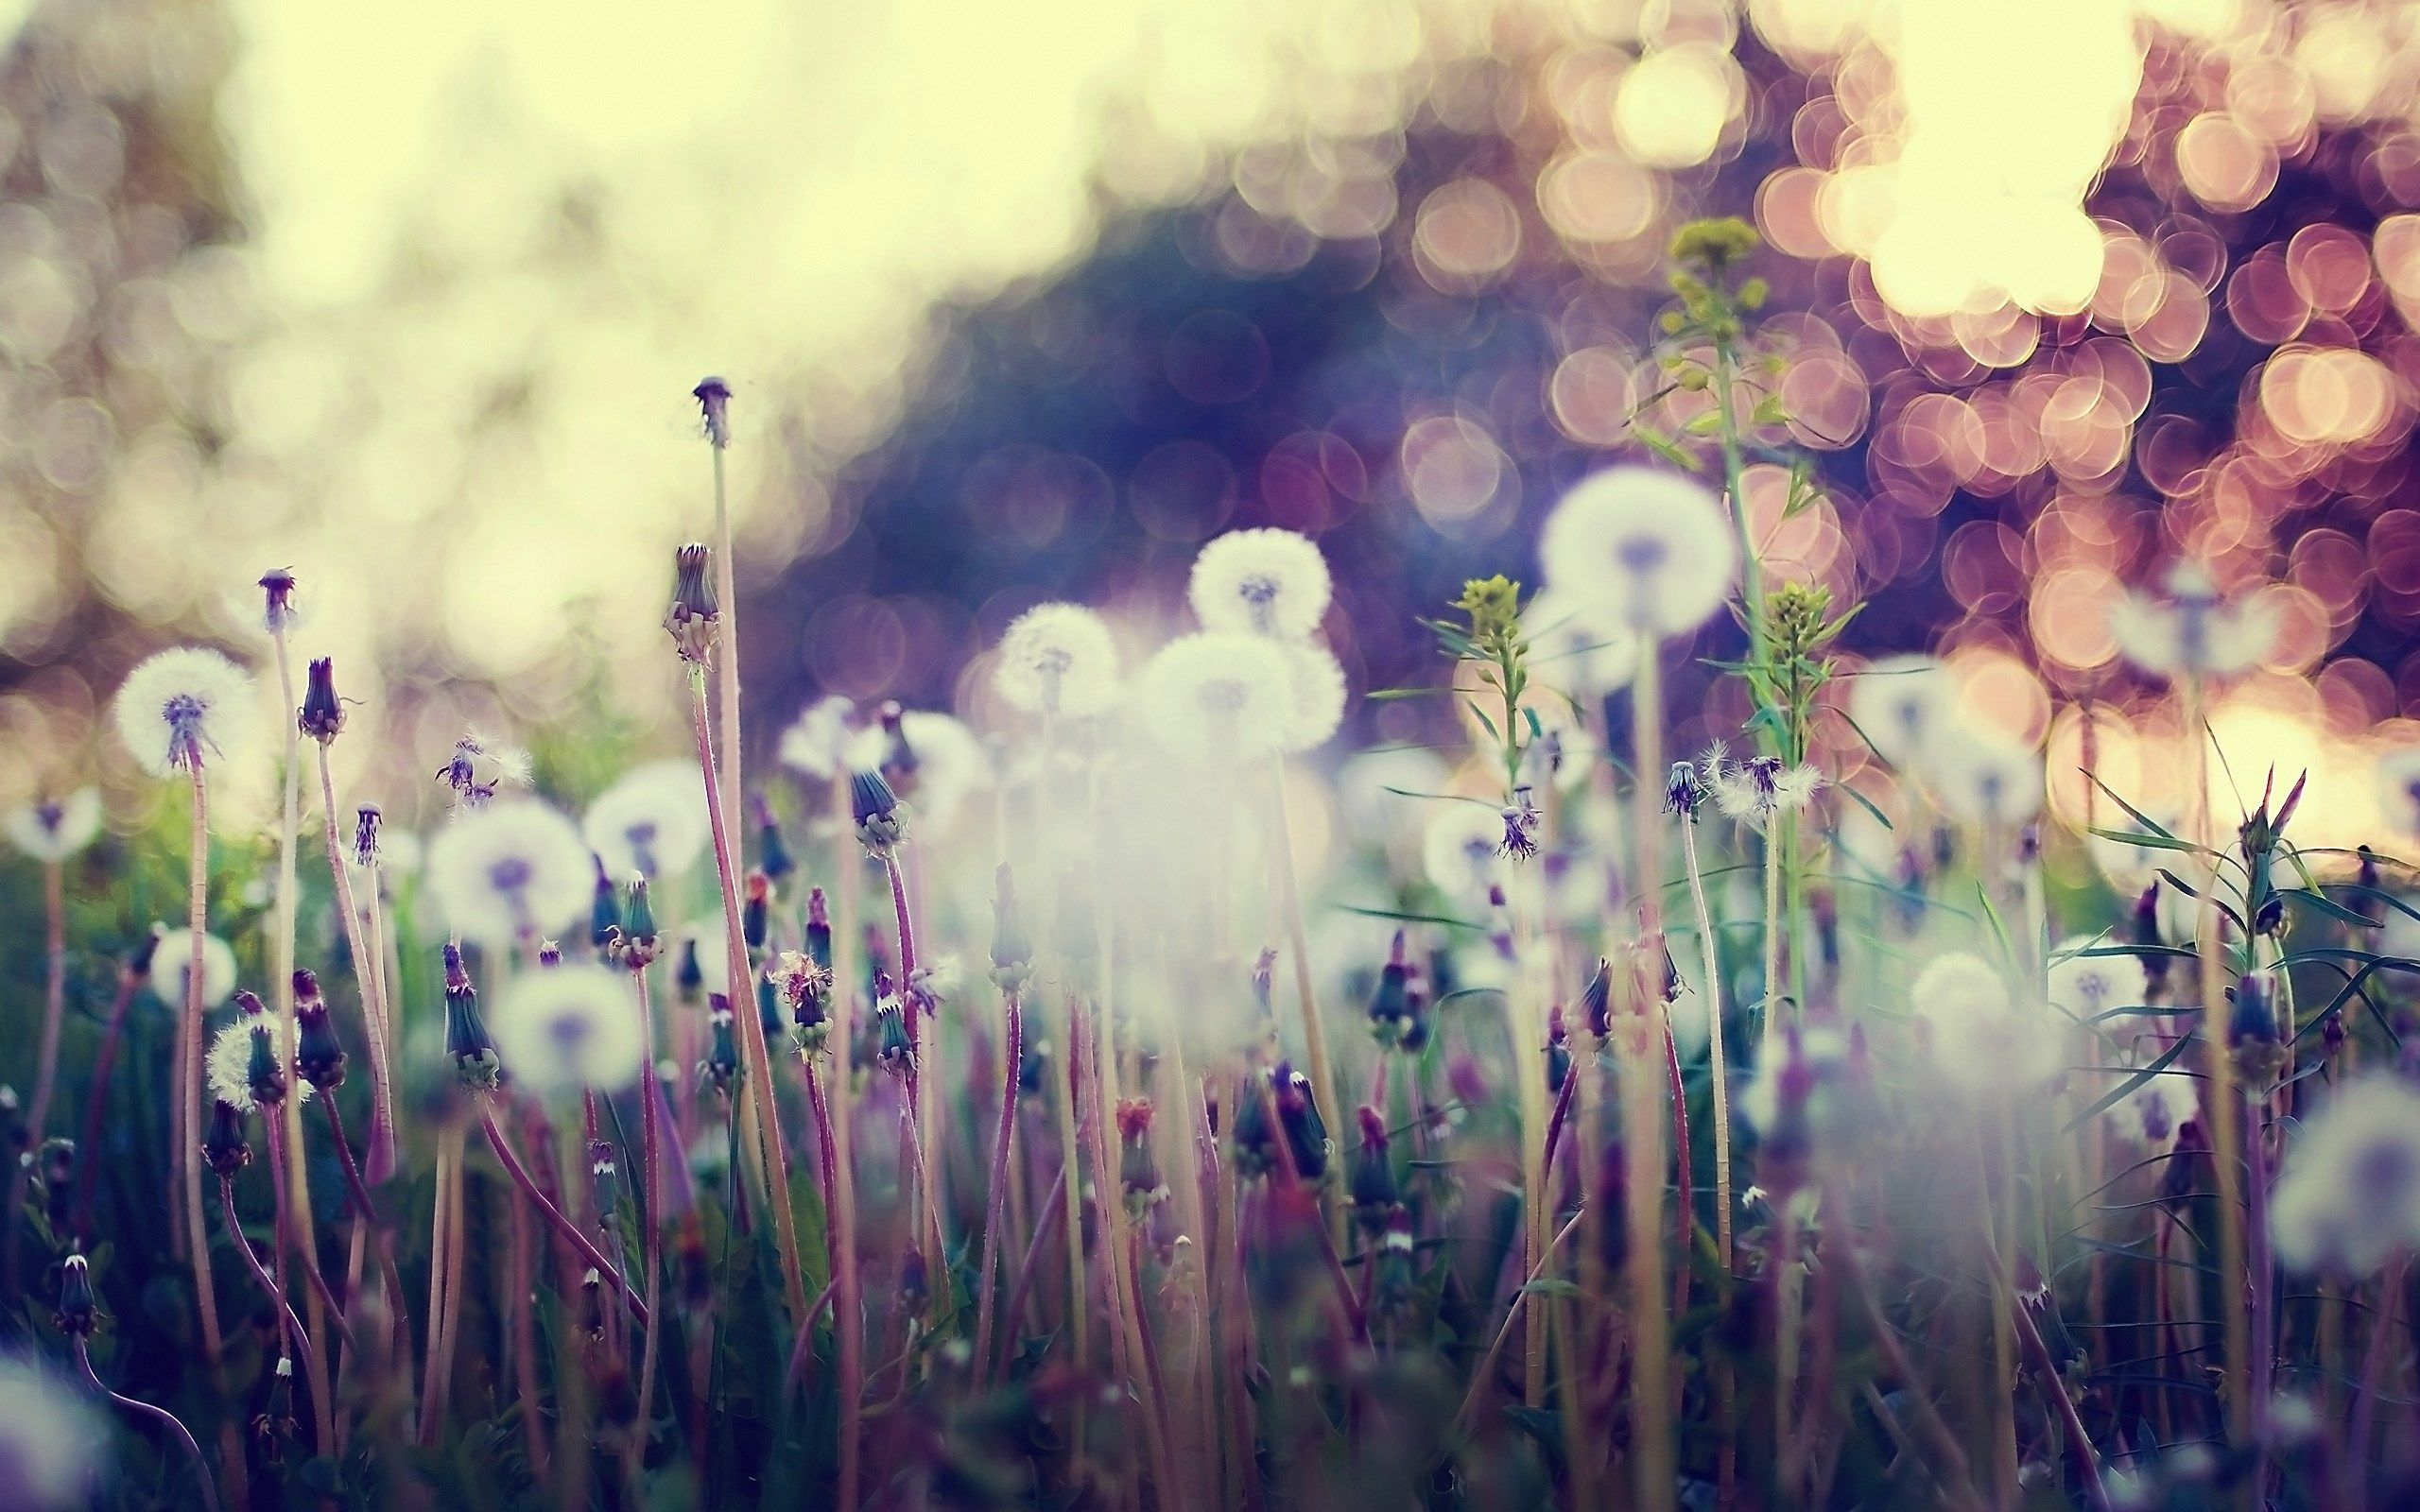 macro wallpaper | macro-dandelions-grass-flowers-nature-hd